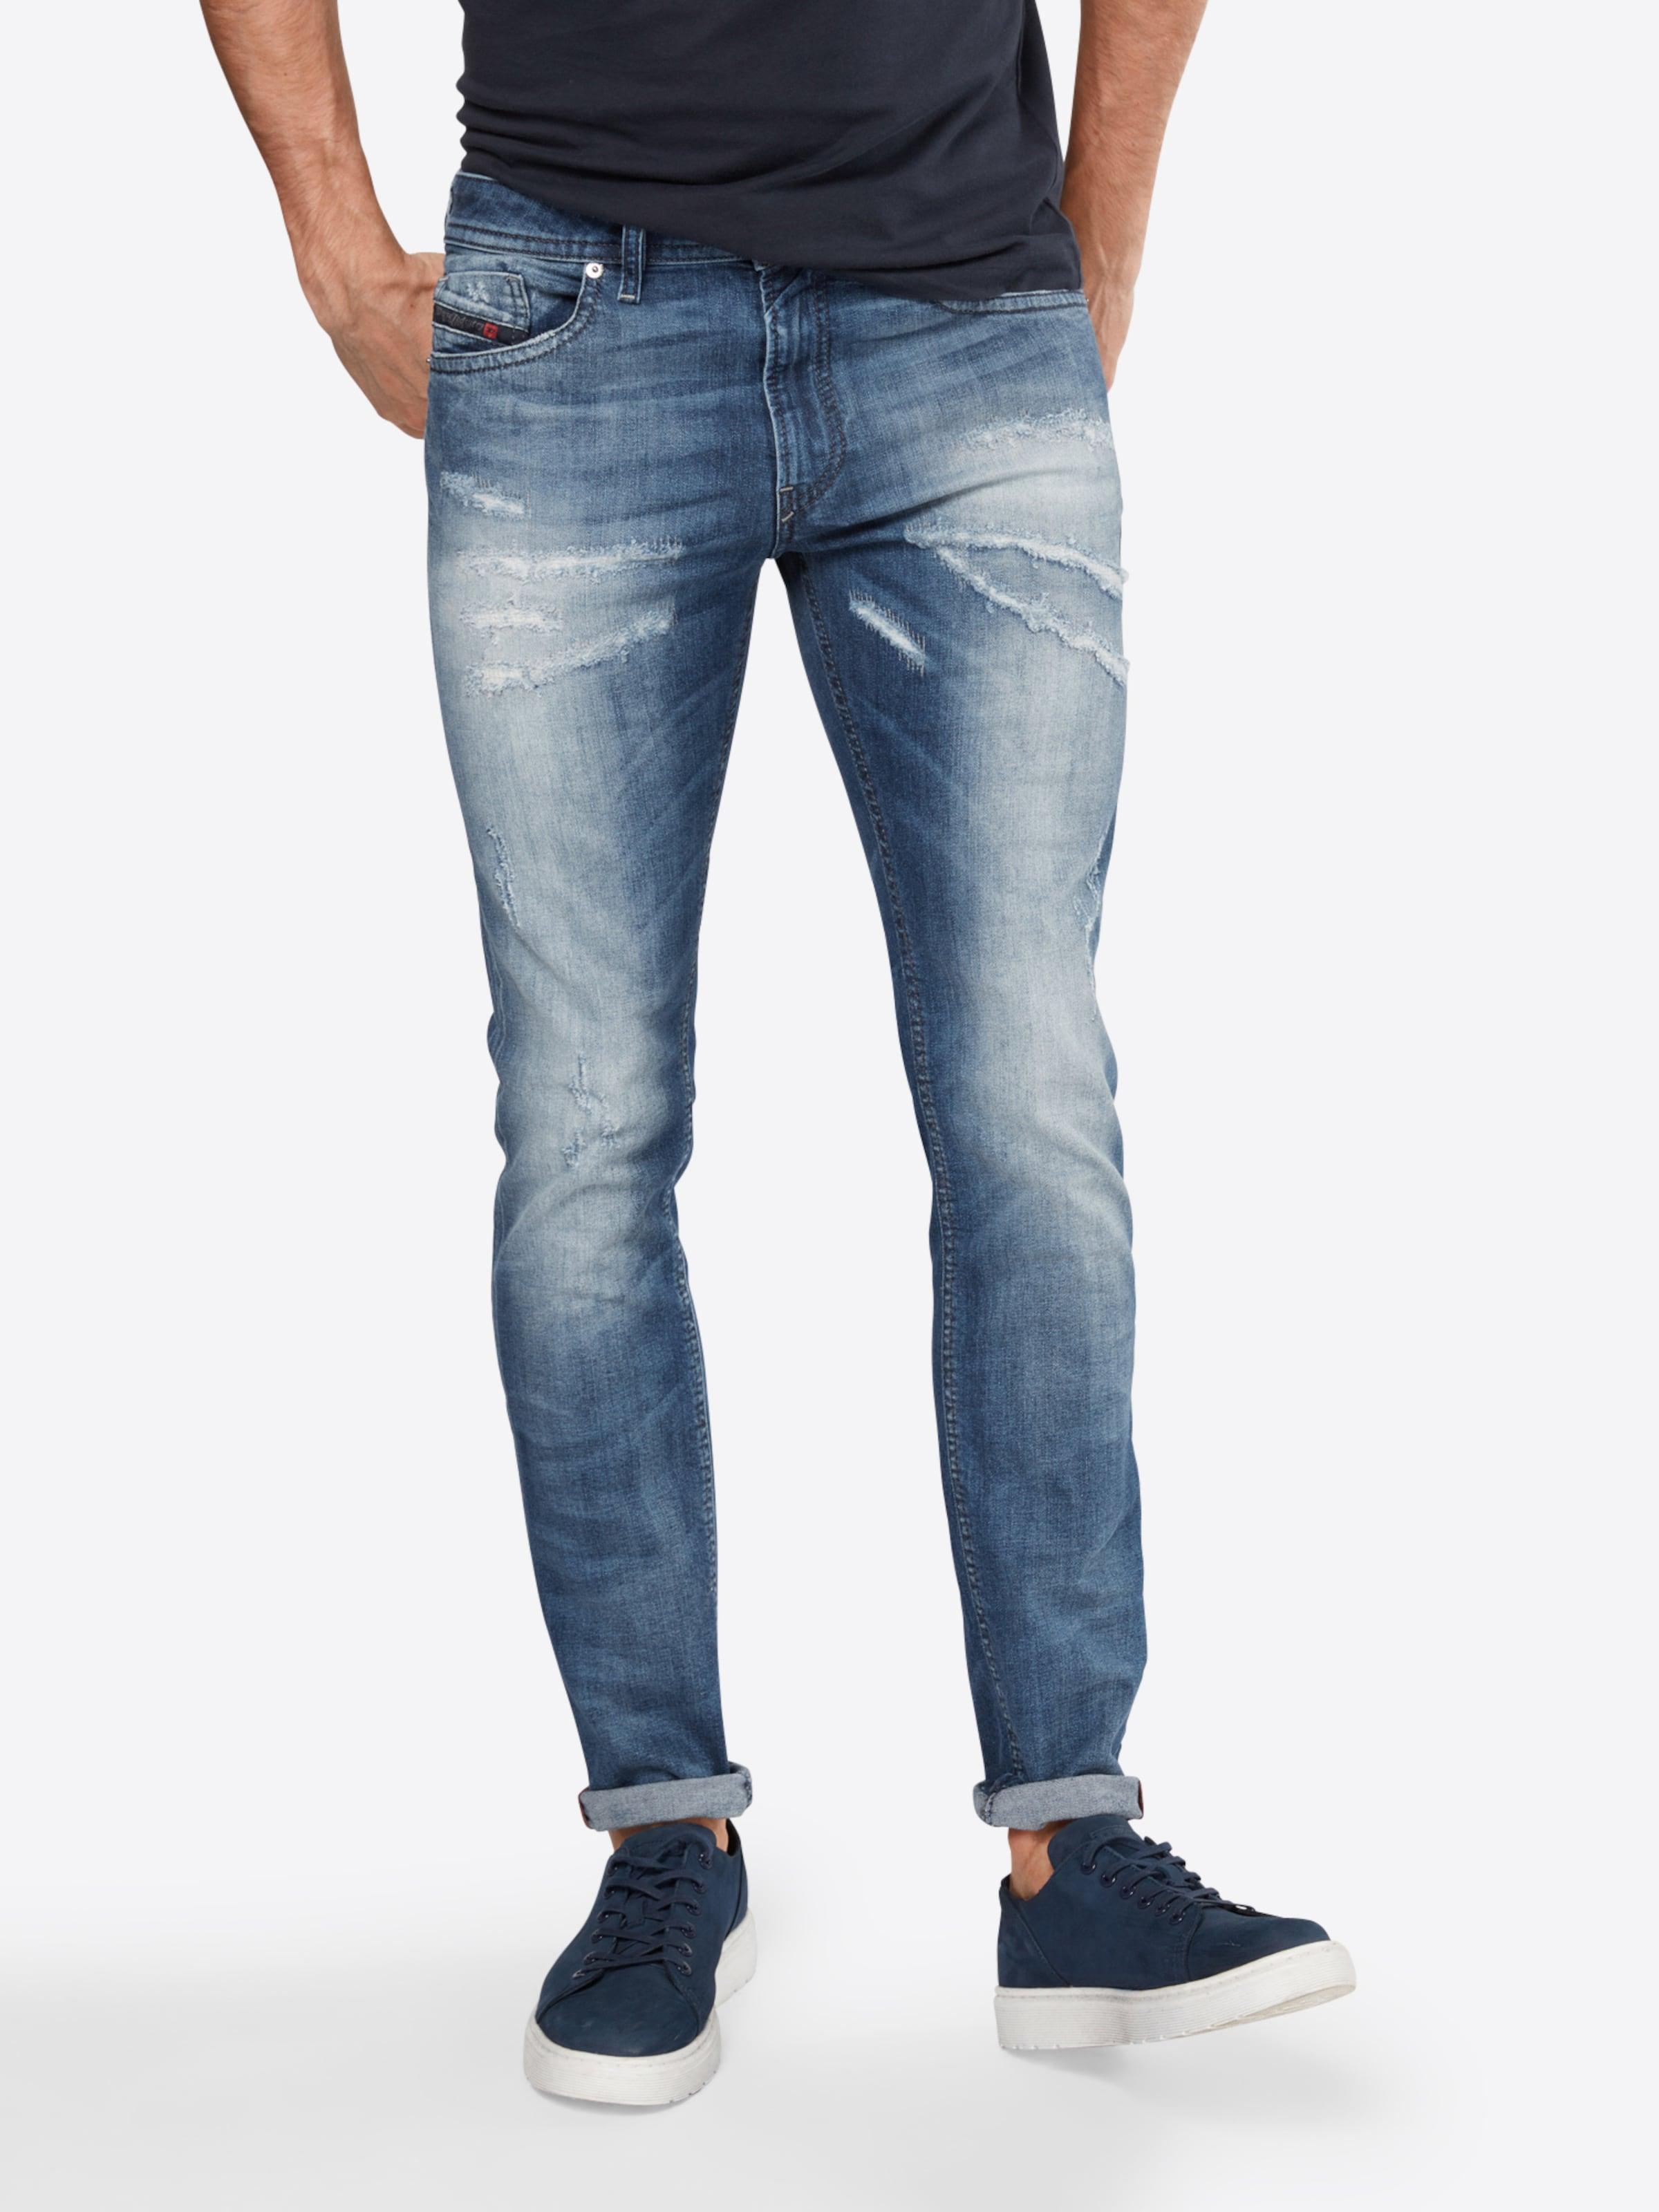 Mit Mastercard Online-Verkauf DIESEL 'Thommer' Jeans Skinny Fit 845F Steckdose Exklusive qbyzz7dCS